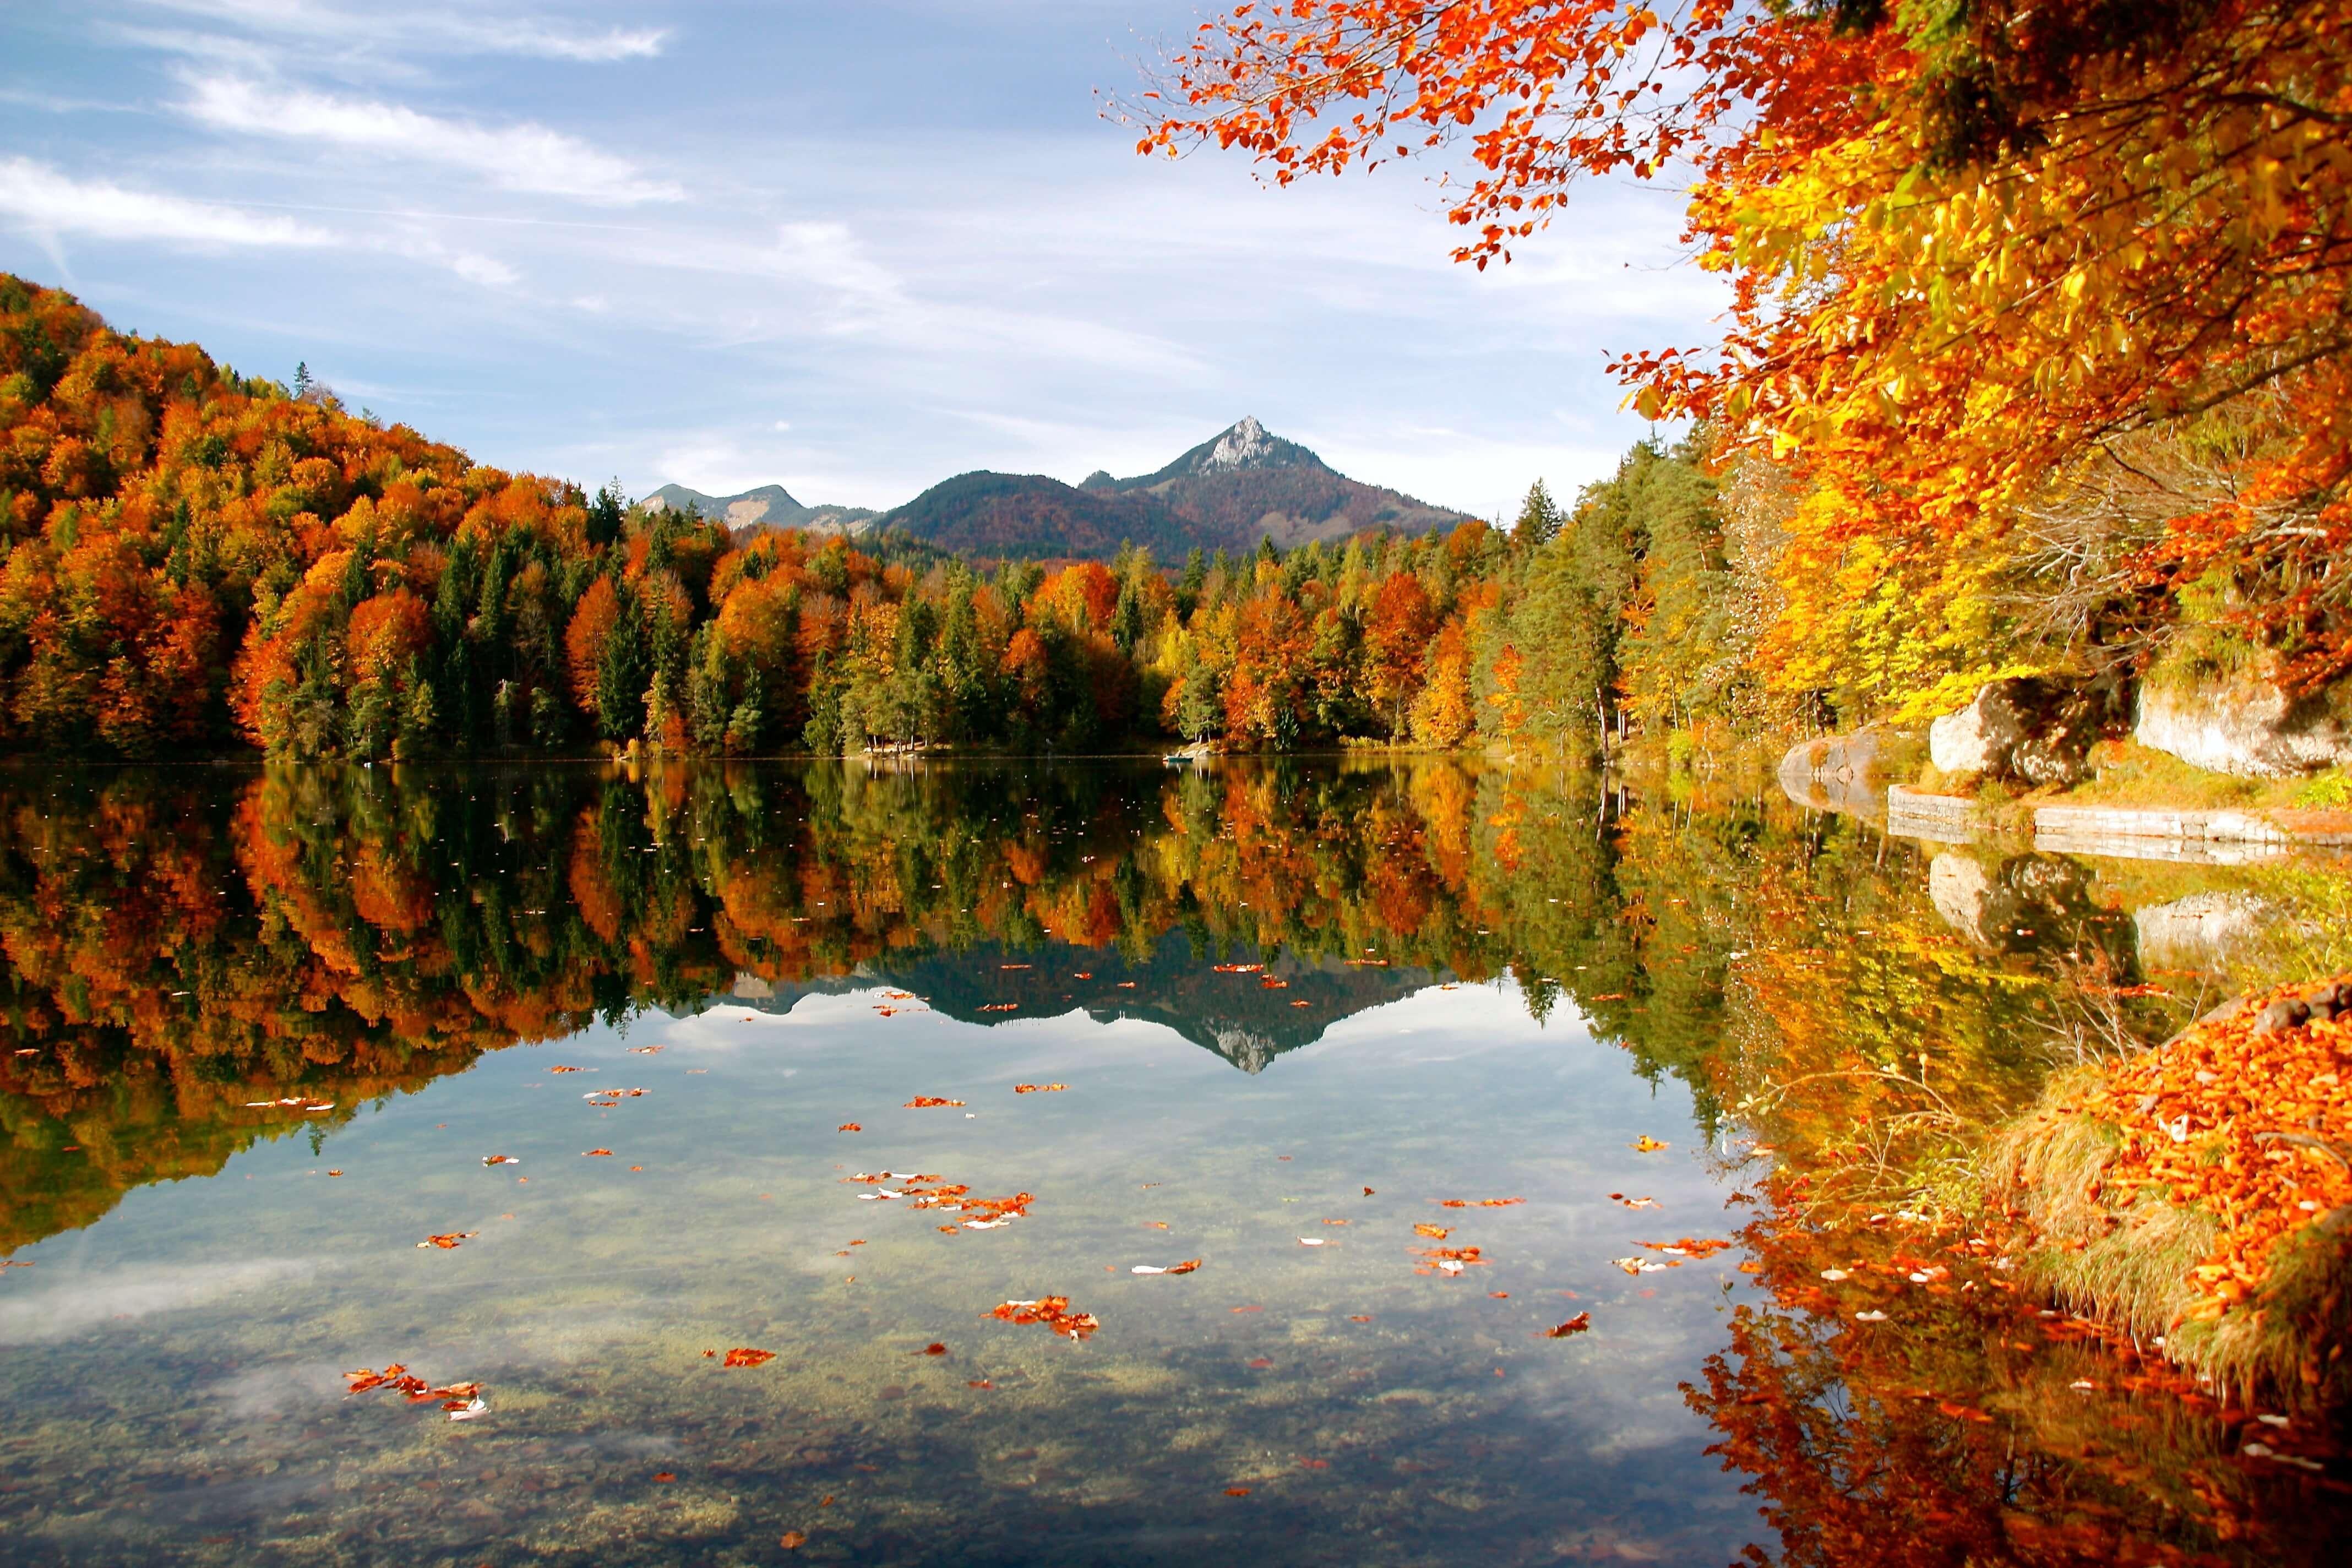 Mountain late in autumn